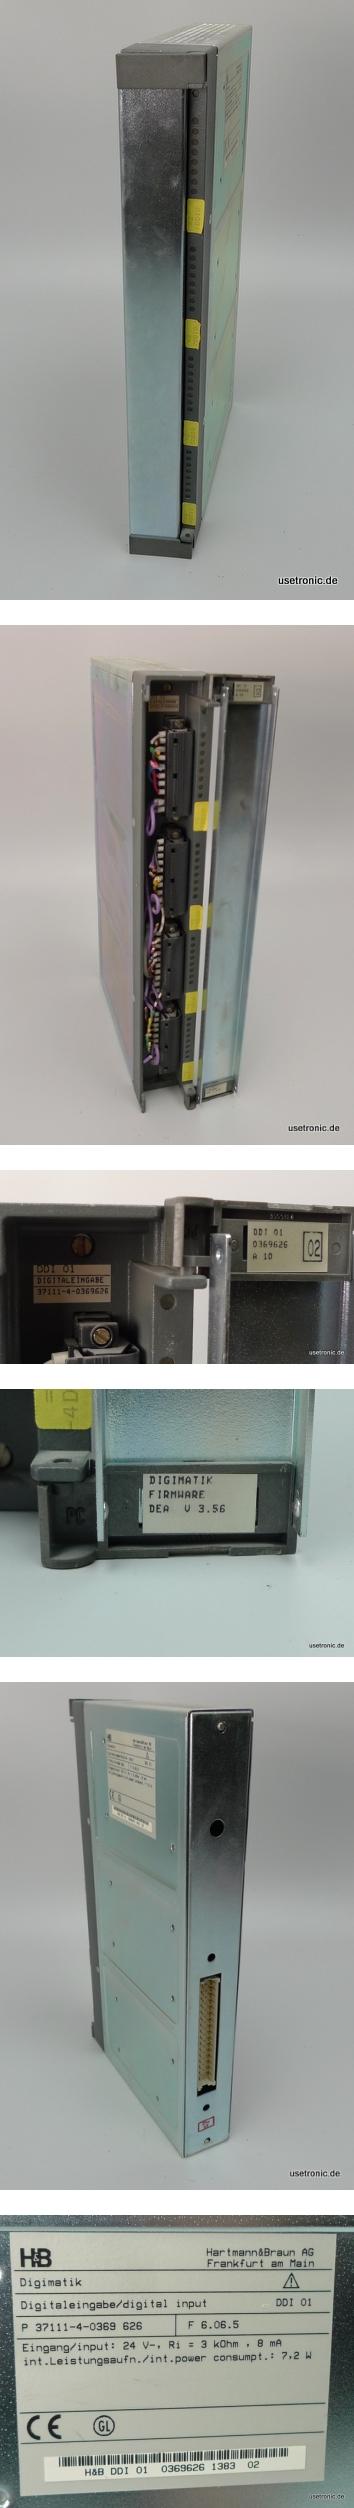 Hartmann Braun Digimatik Digital In SPS P-37111-4-0369-626 DDI-01